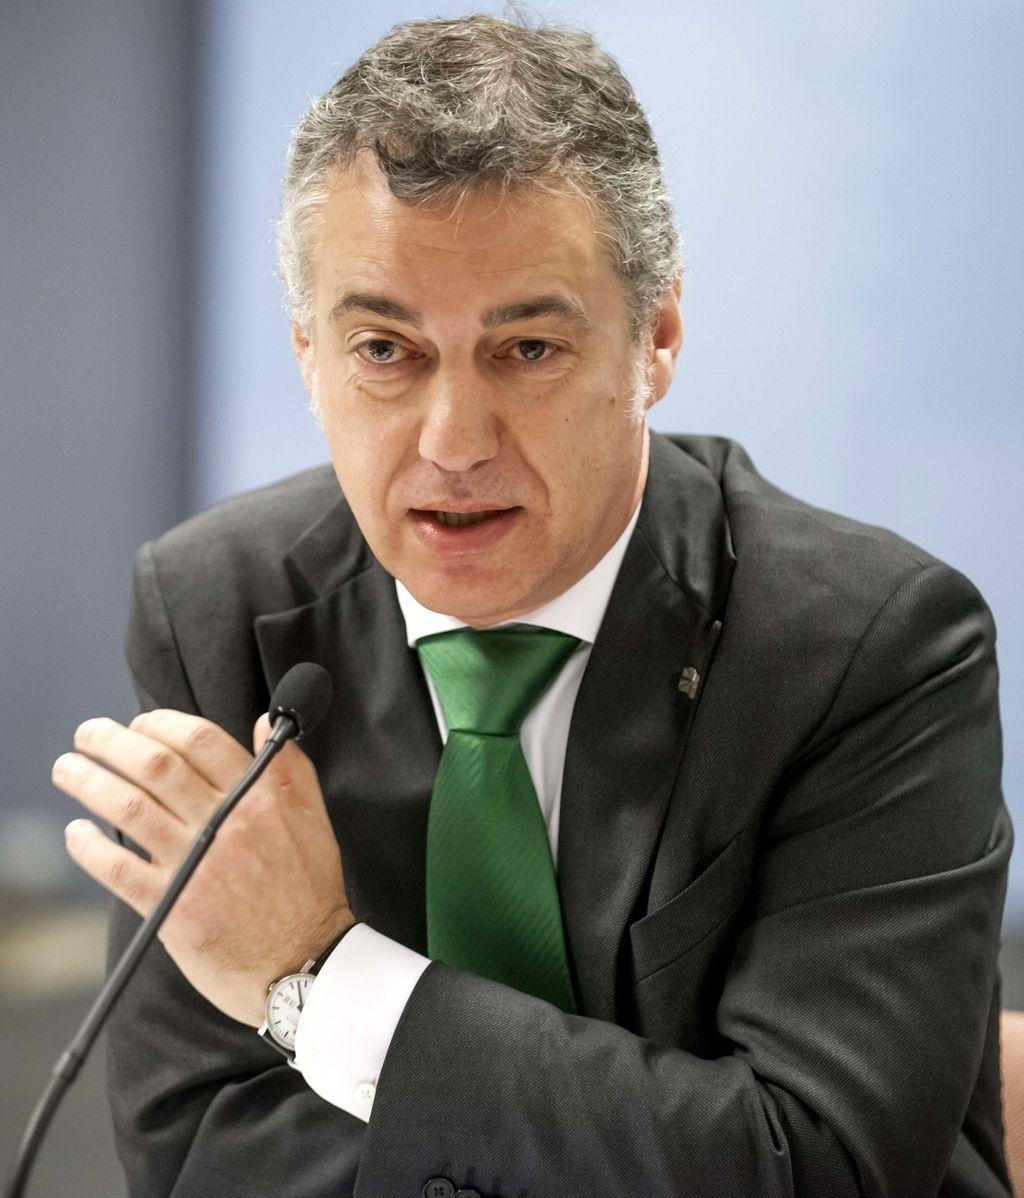 El lehendakari, Íñigo Urkullu, en el País Vasco